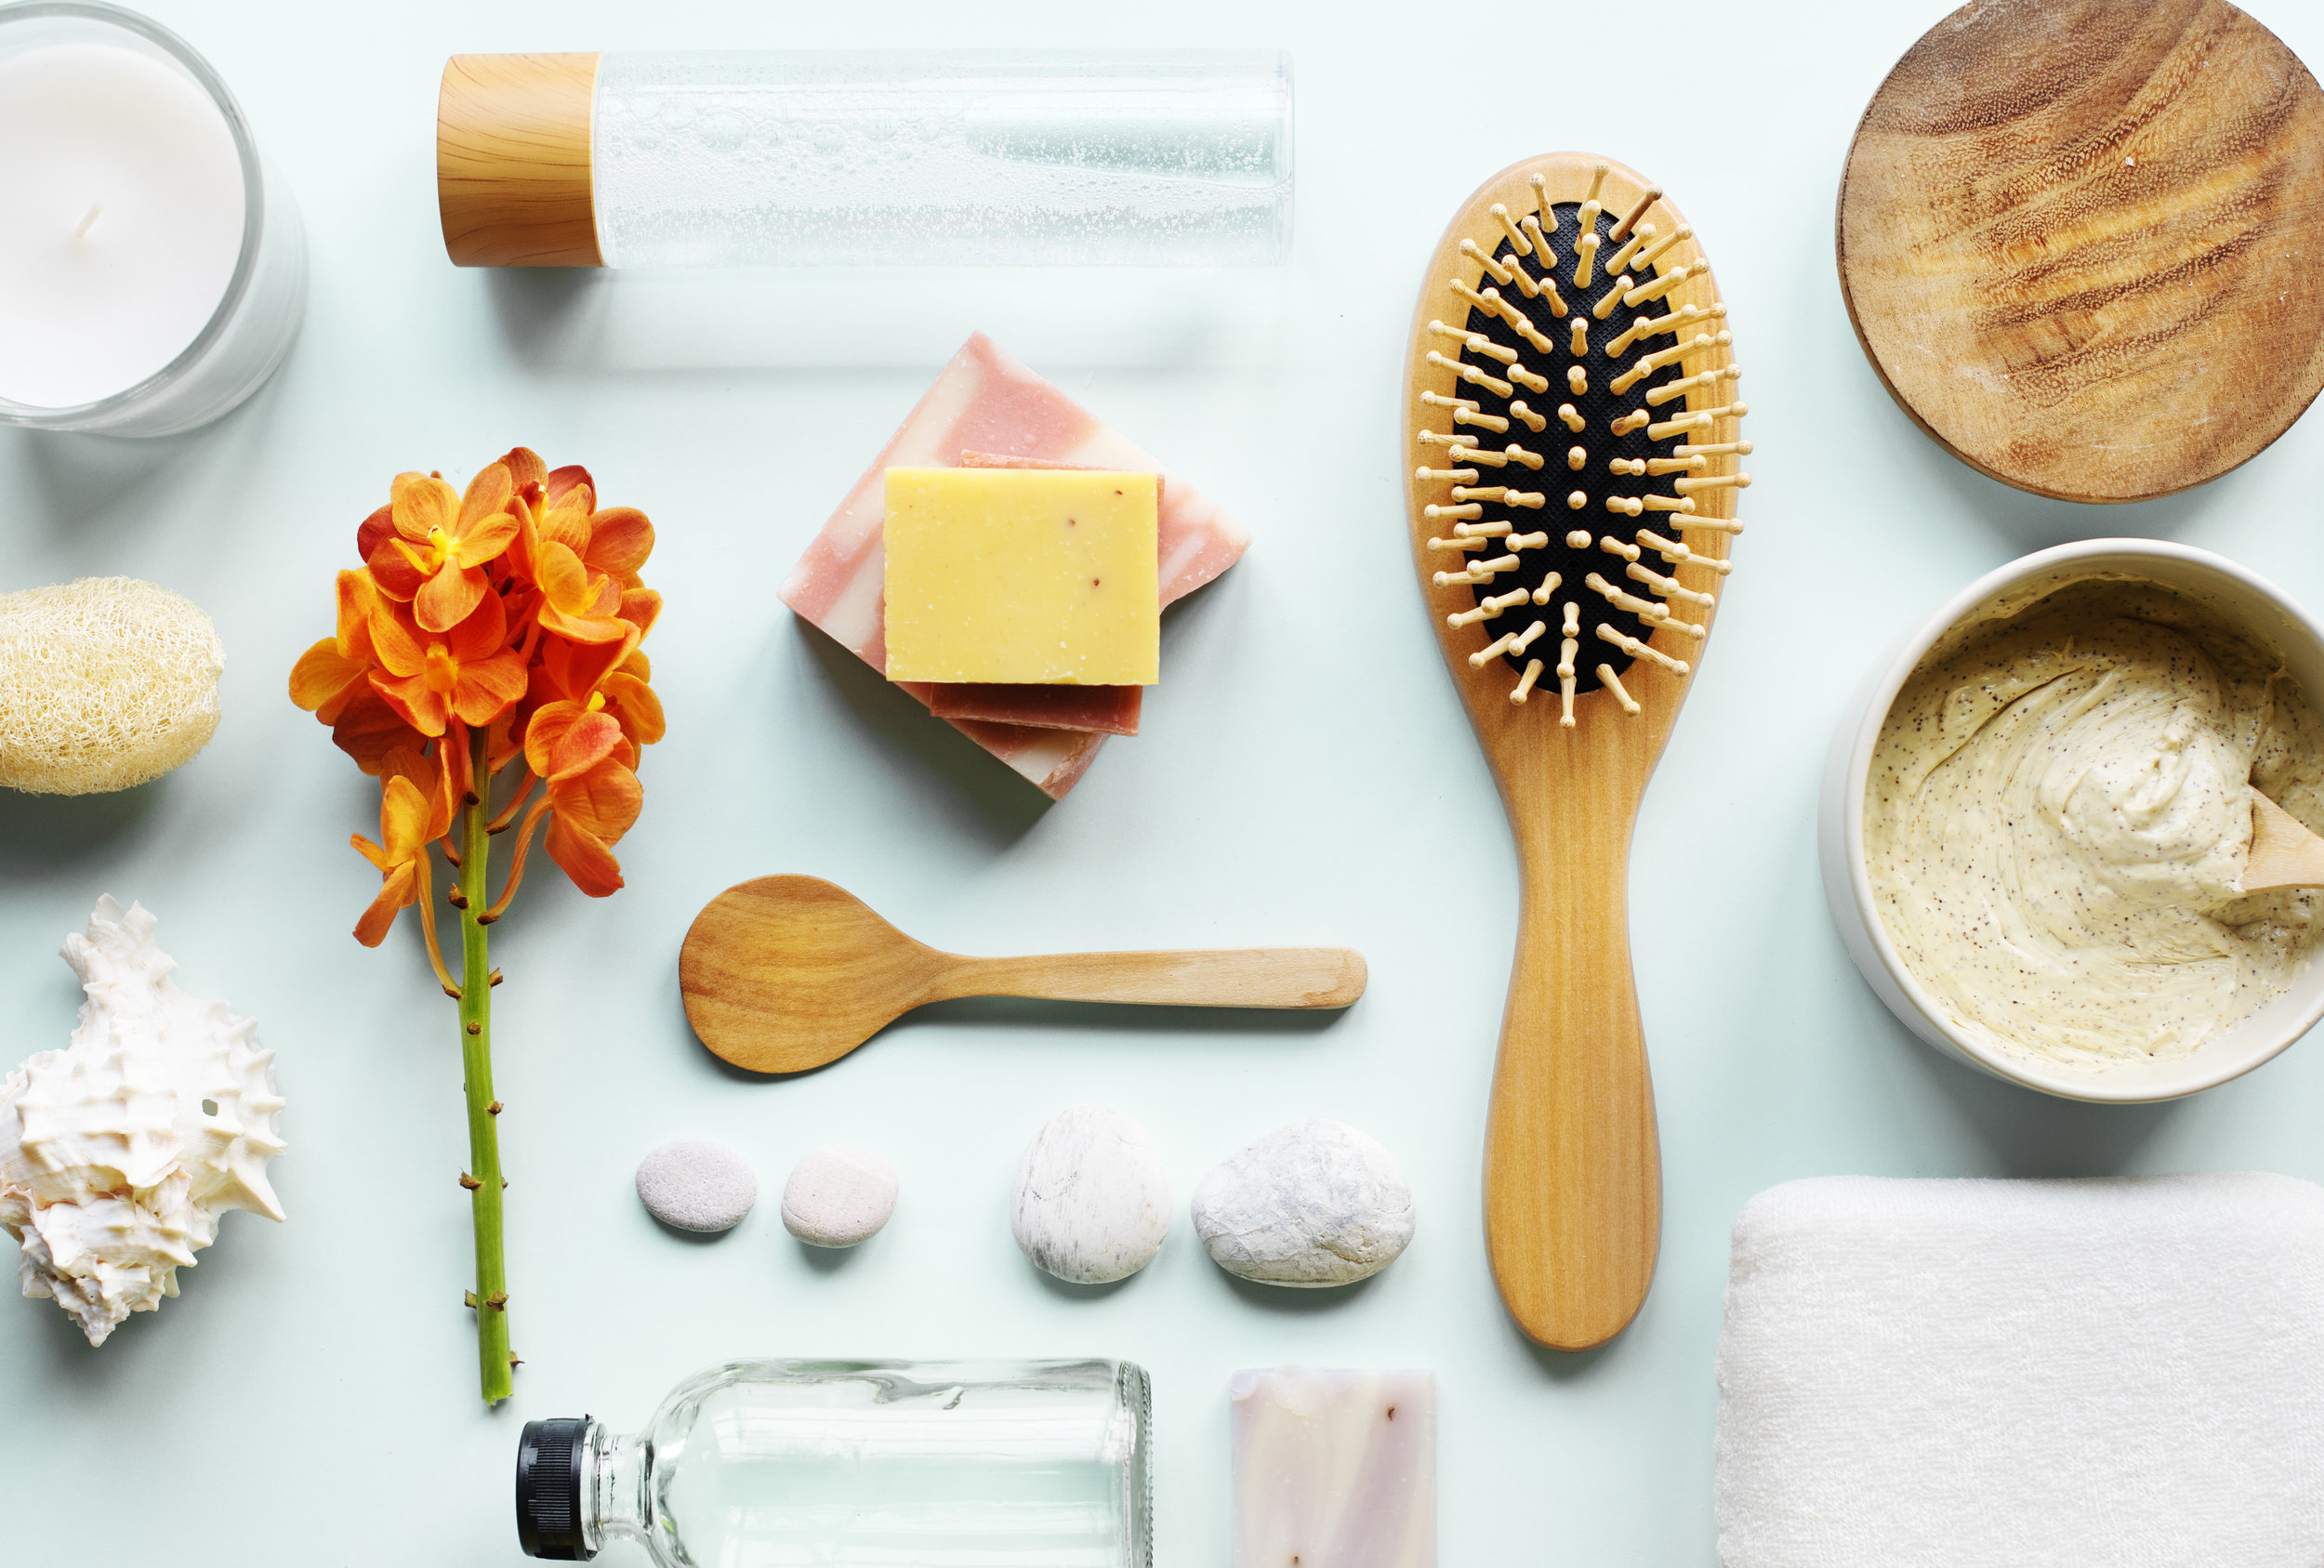 skincare-aromatherapy-objects-flatlay-PJHNT2A.jpg